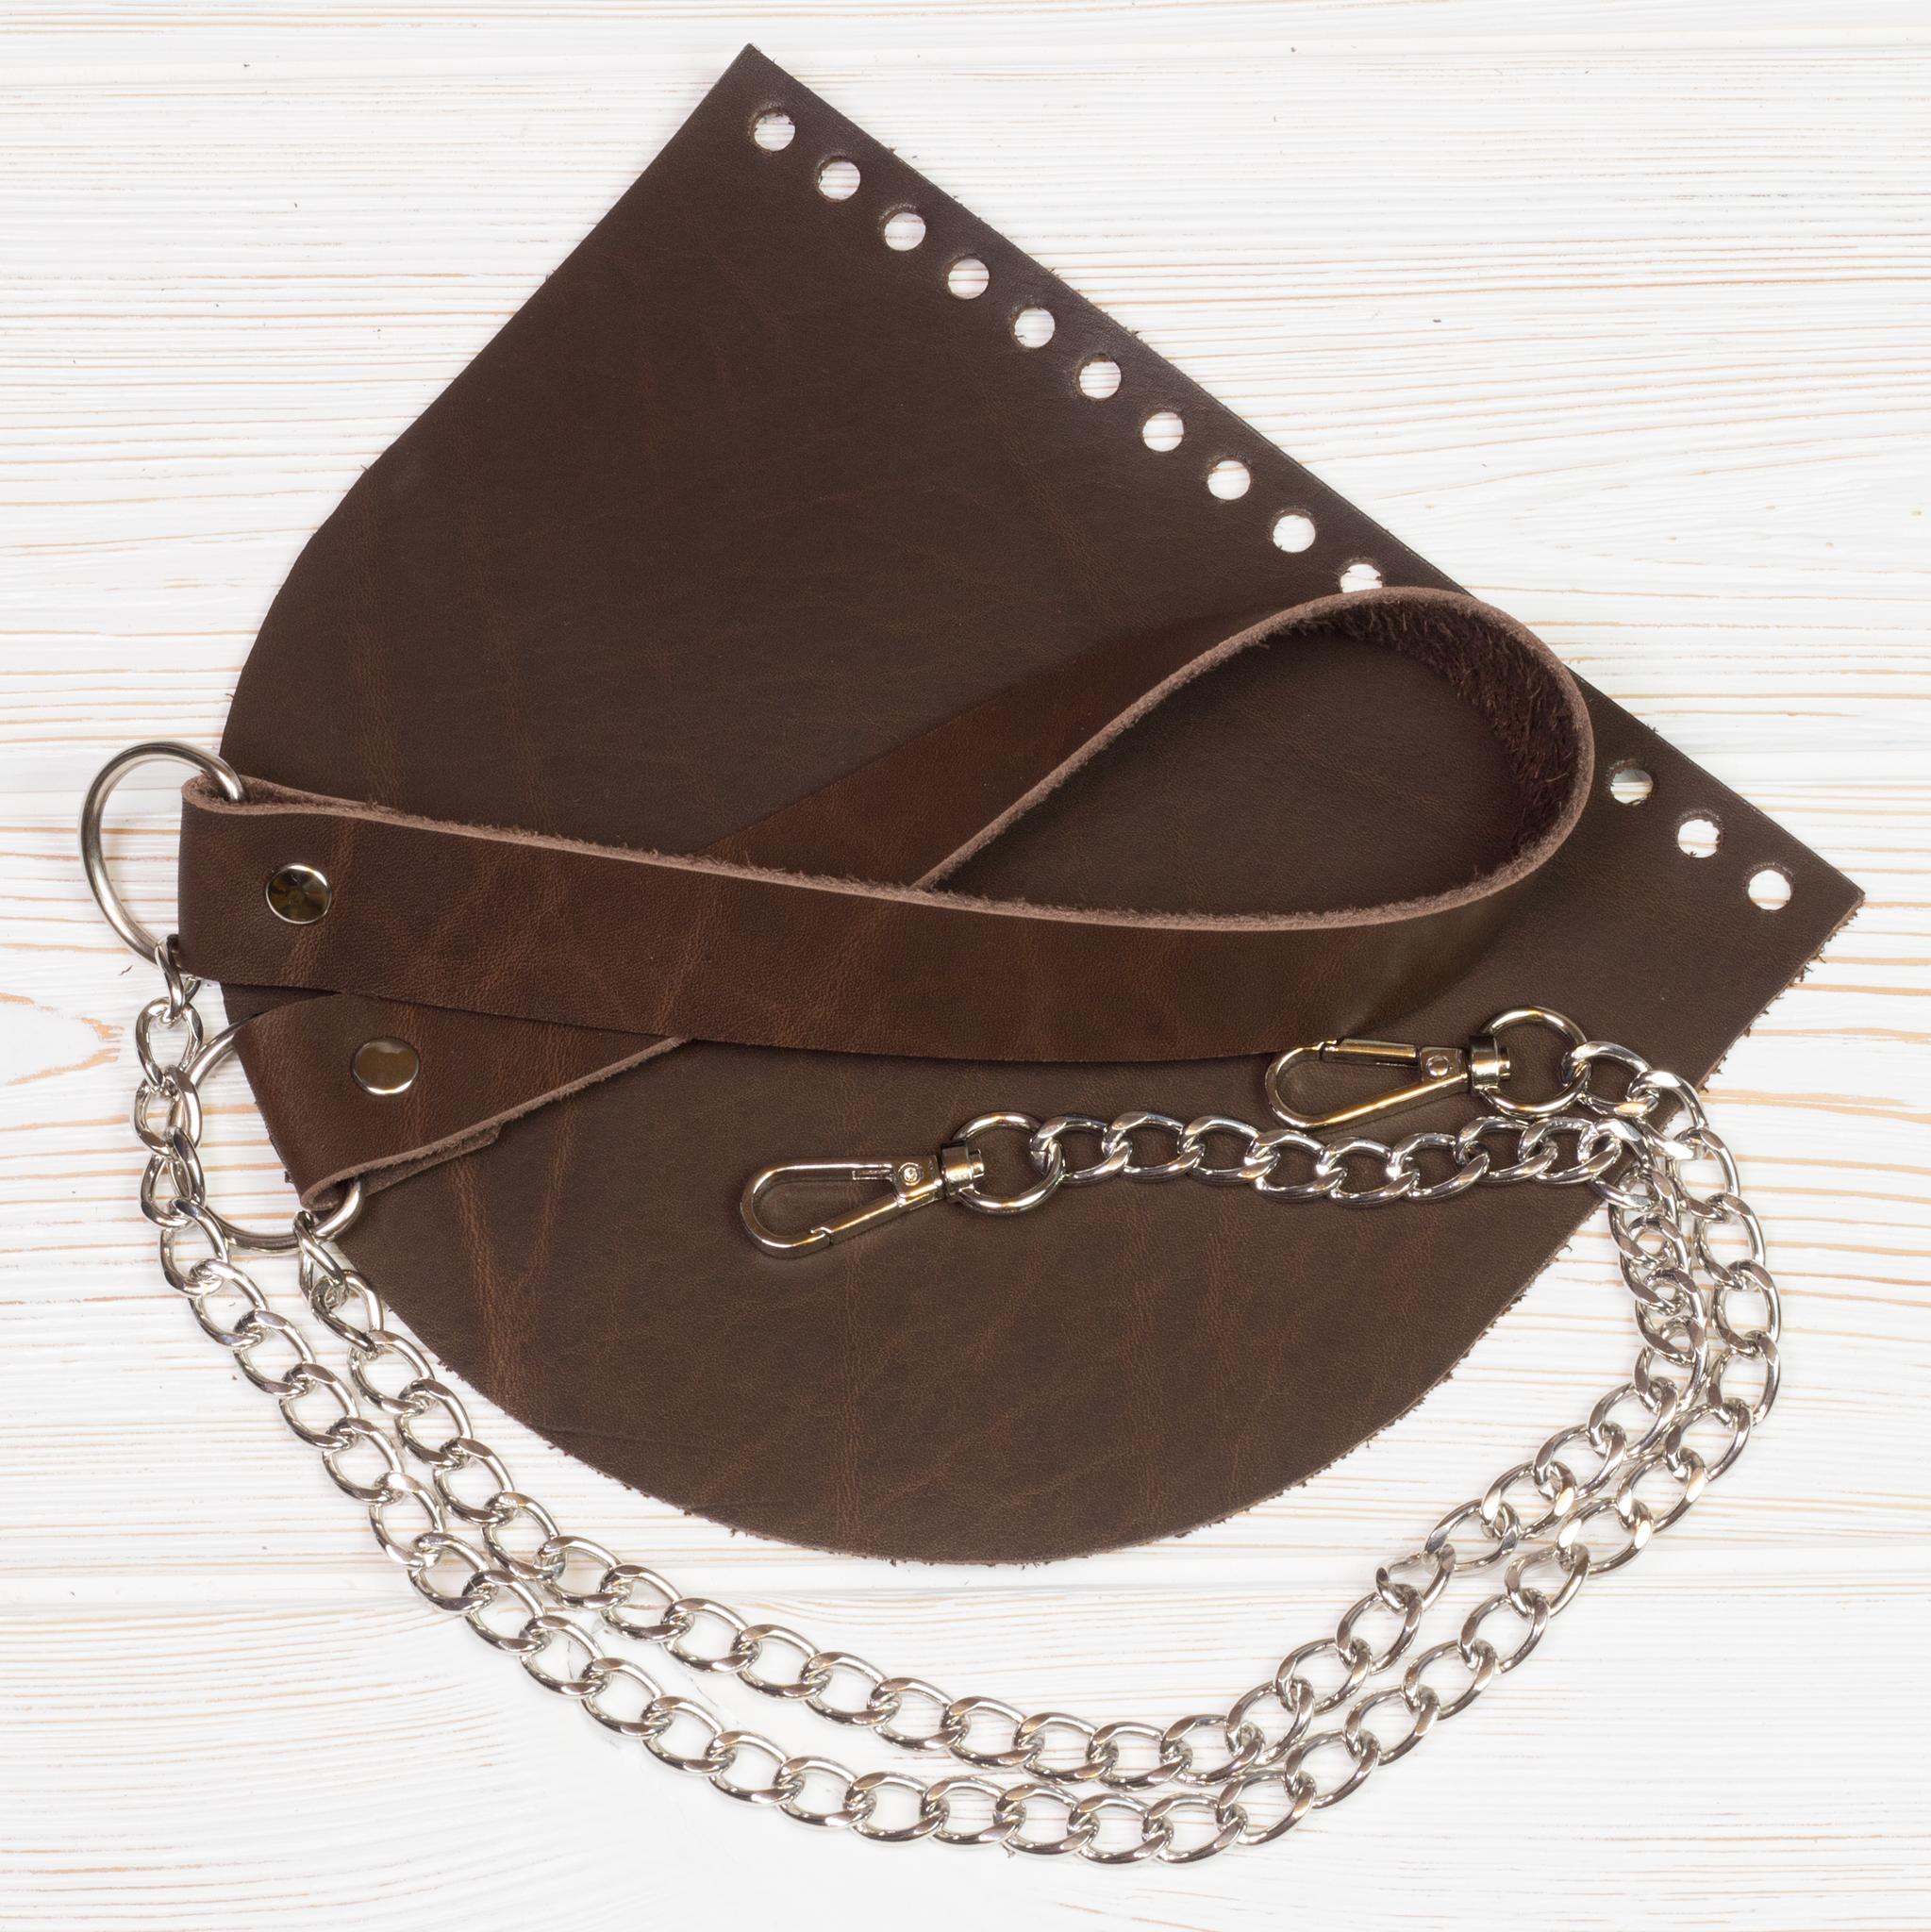 "Каталог Комплект для сумки ""Венге"" IMG_1064333.jpg"